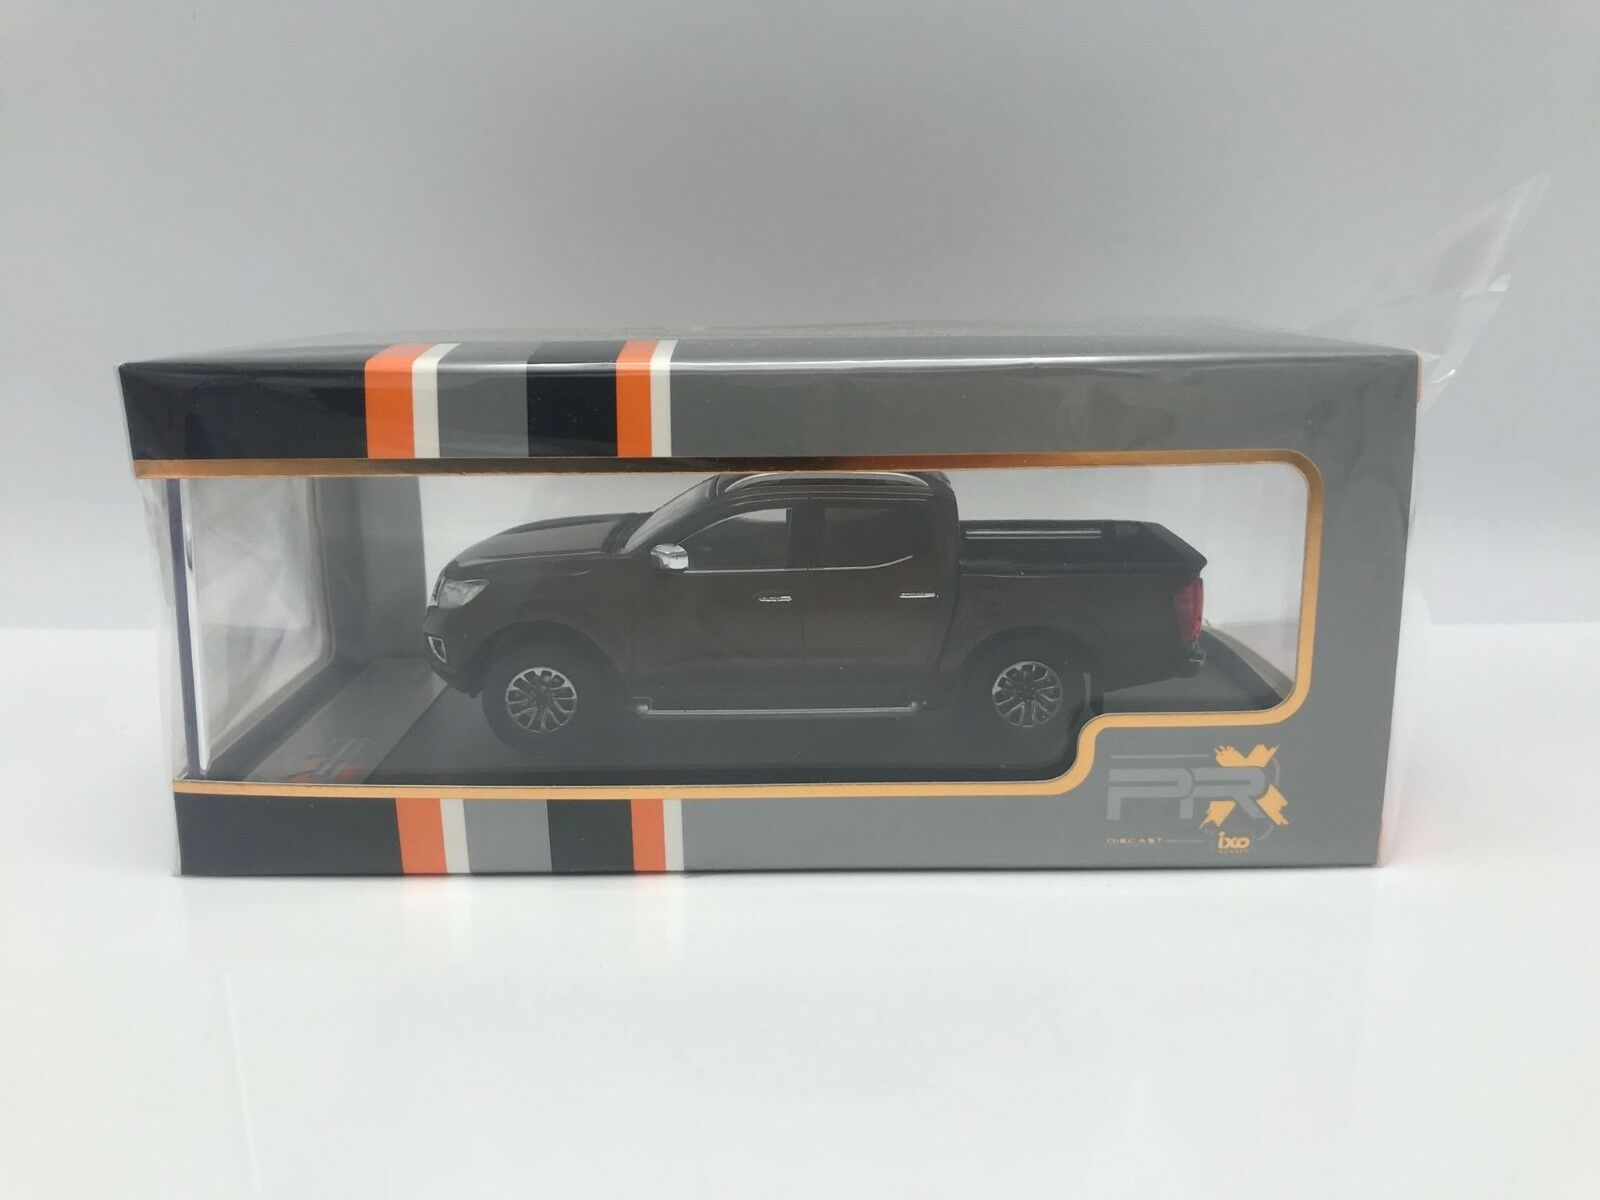 PremiumX PRXD593 Nissan Navara braun metallic Maßstab 1:43 Modellauto NEU!°